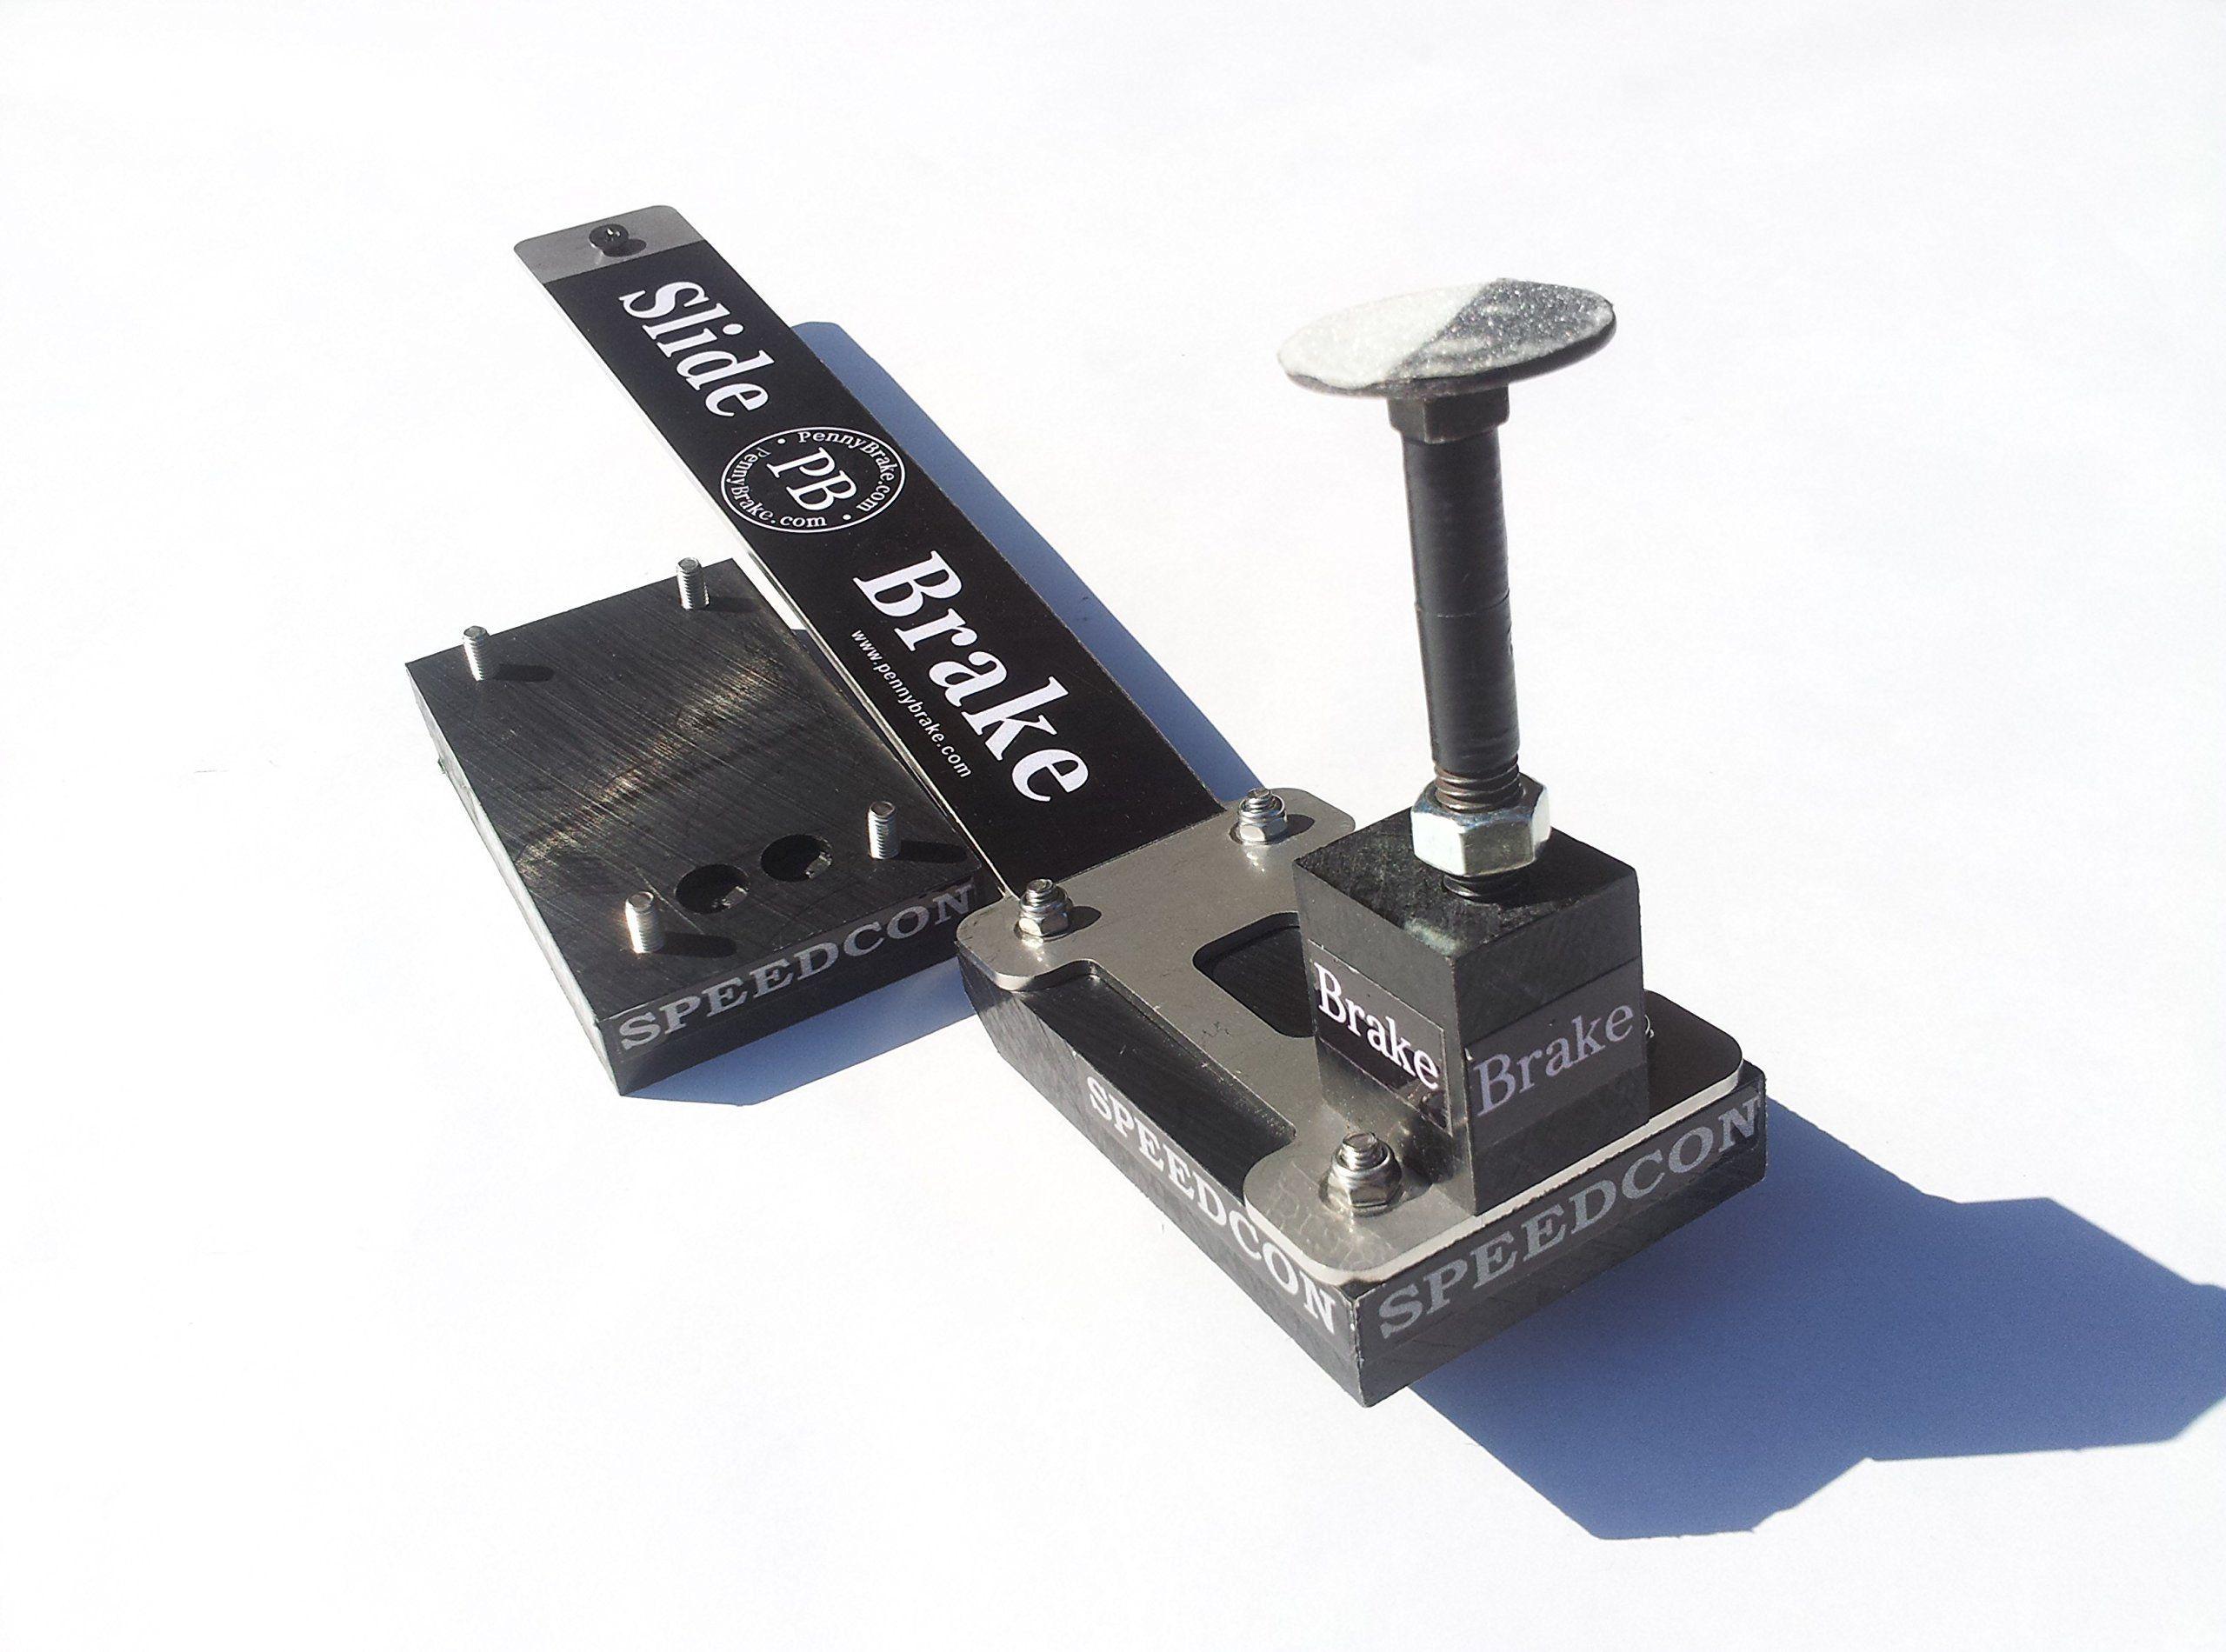 A Single New Ntr Rubber Pad Brake Kit Longboard Brake 2.0 Kit for Top Mount